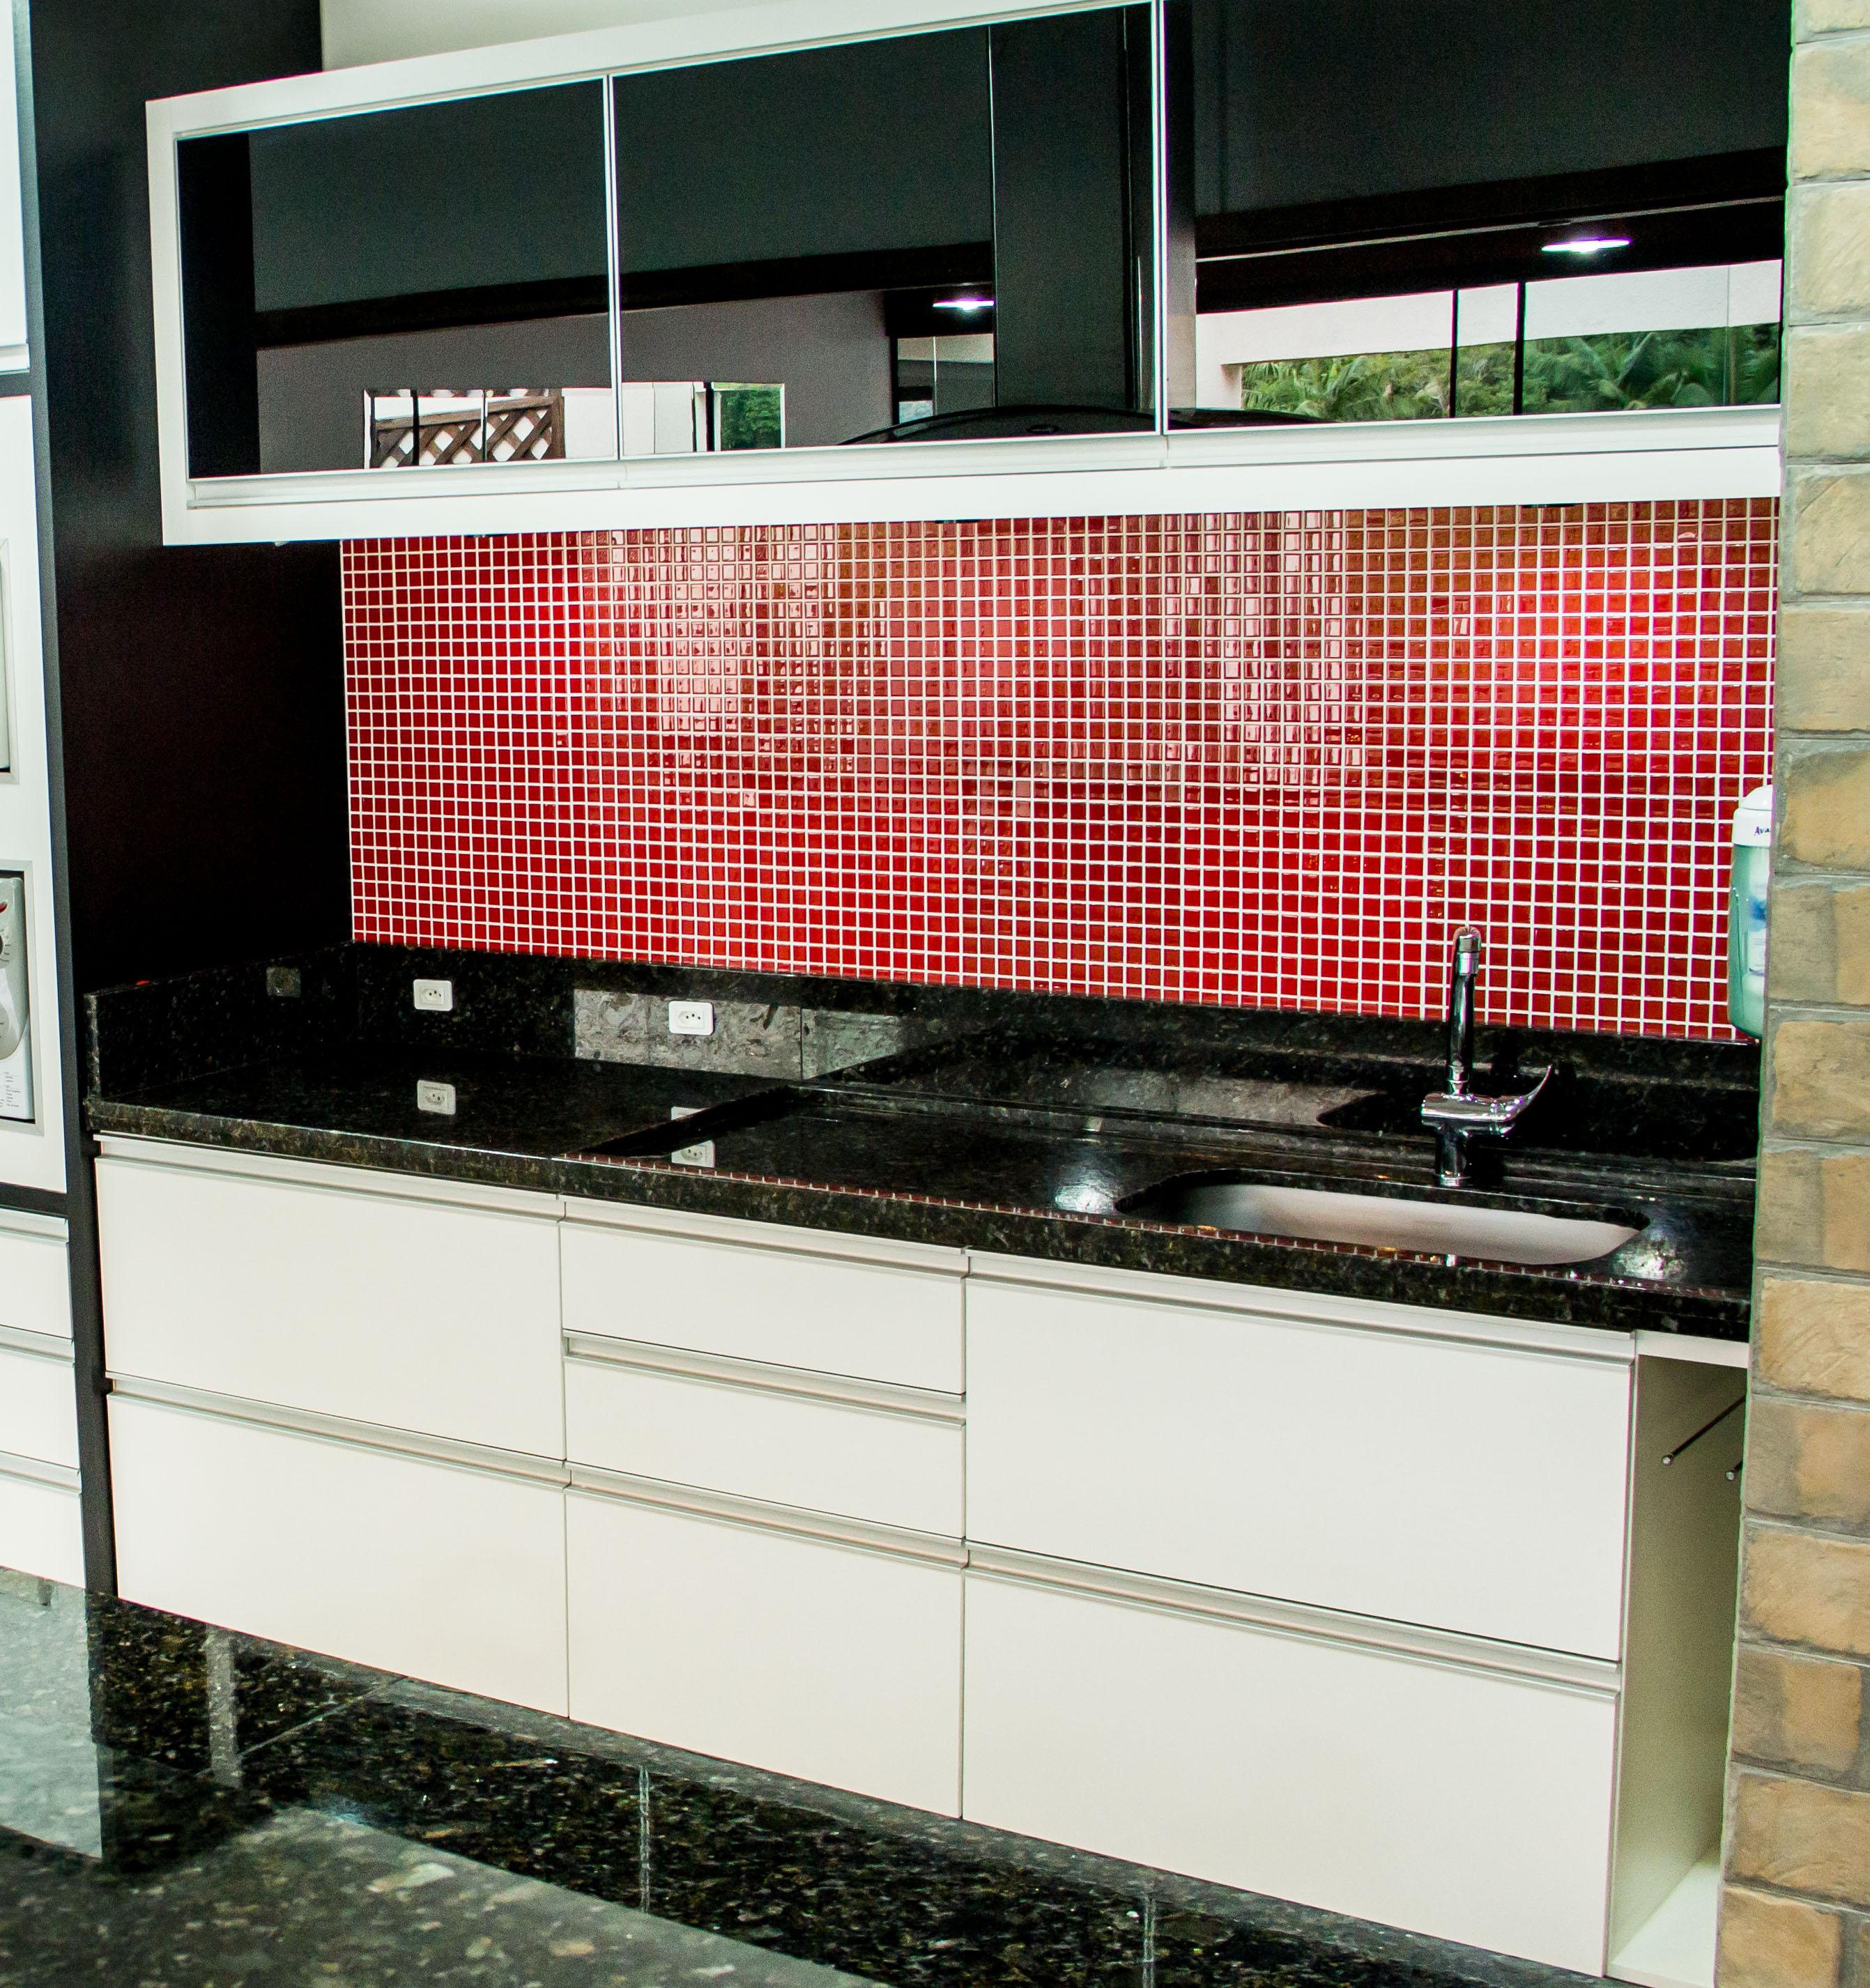 Projetos de Cozinhas Sob Medida Miranda Móveis Blumenau #912620 2683 2853